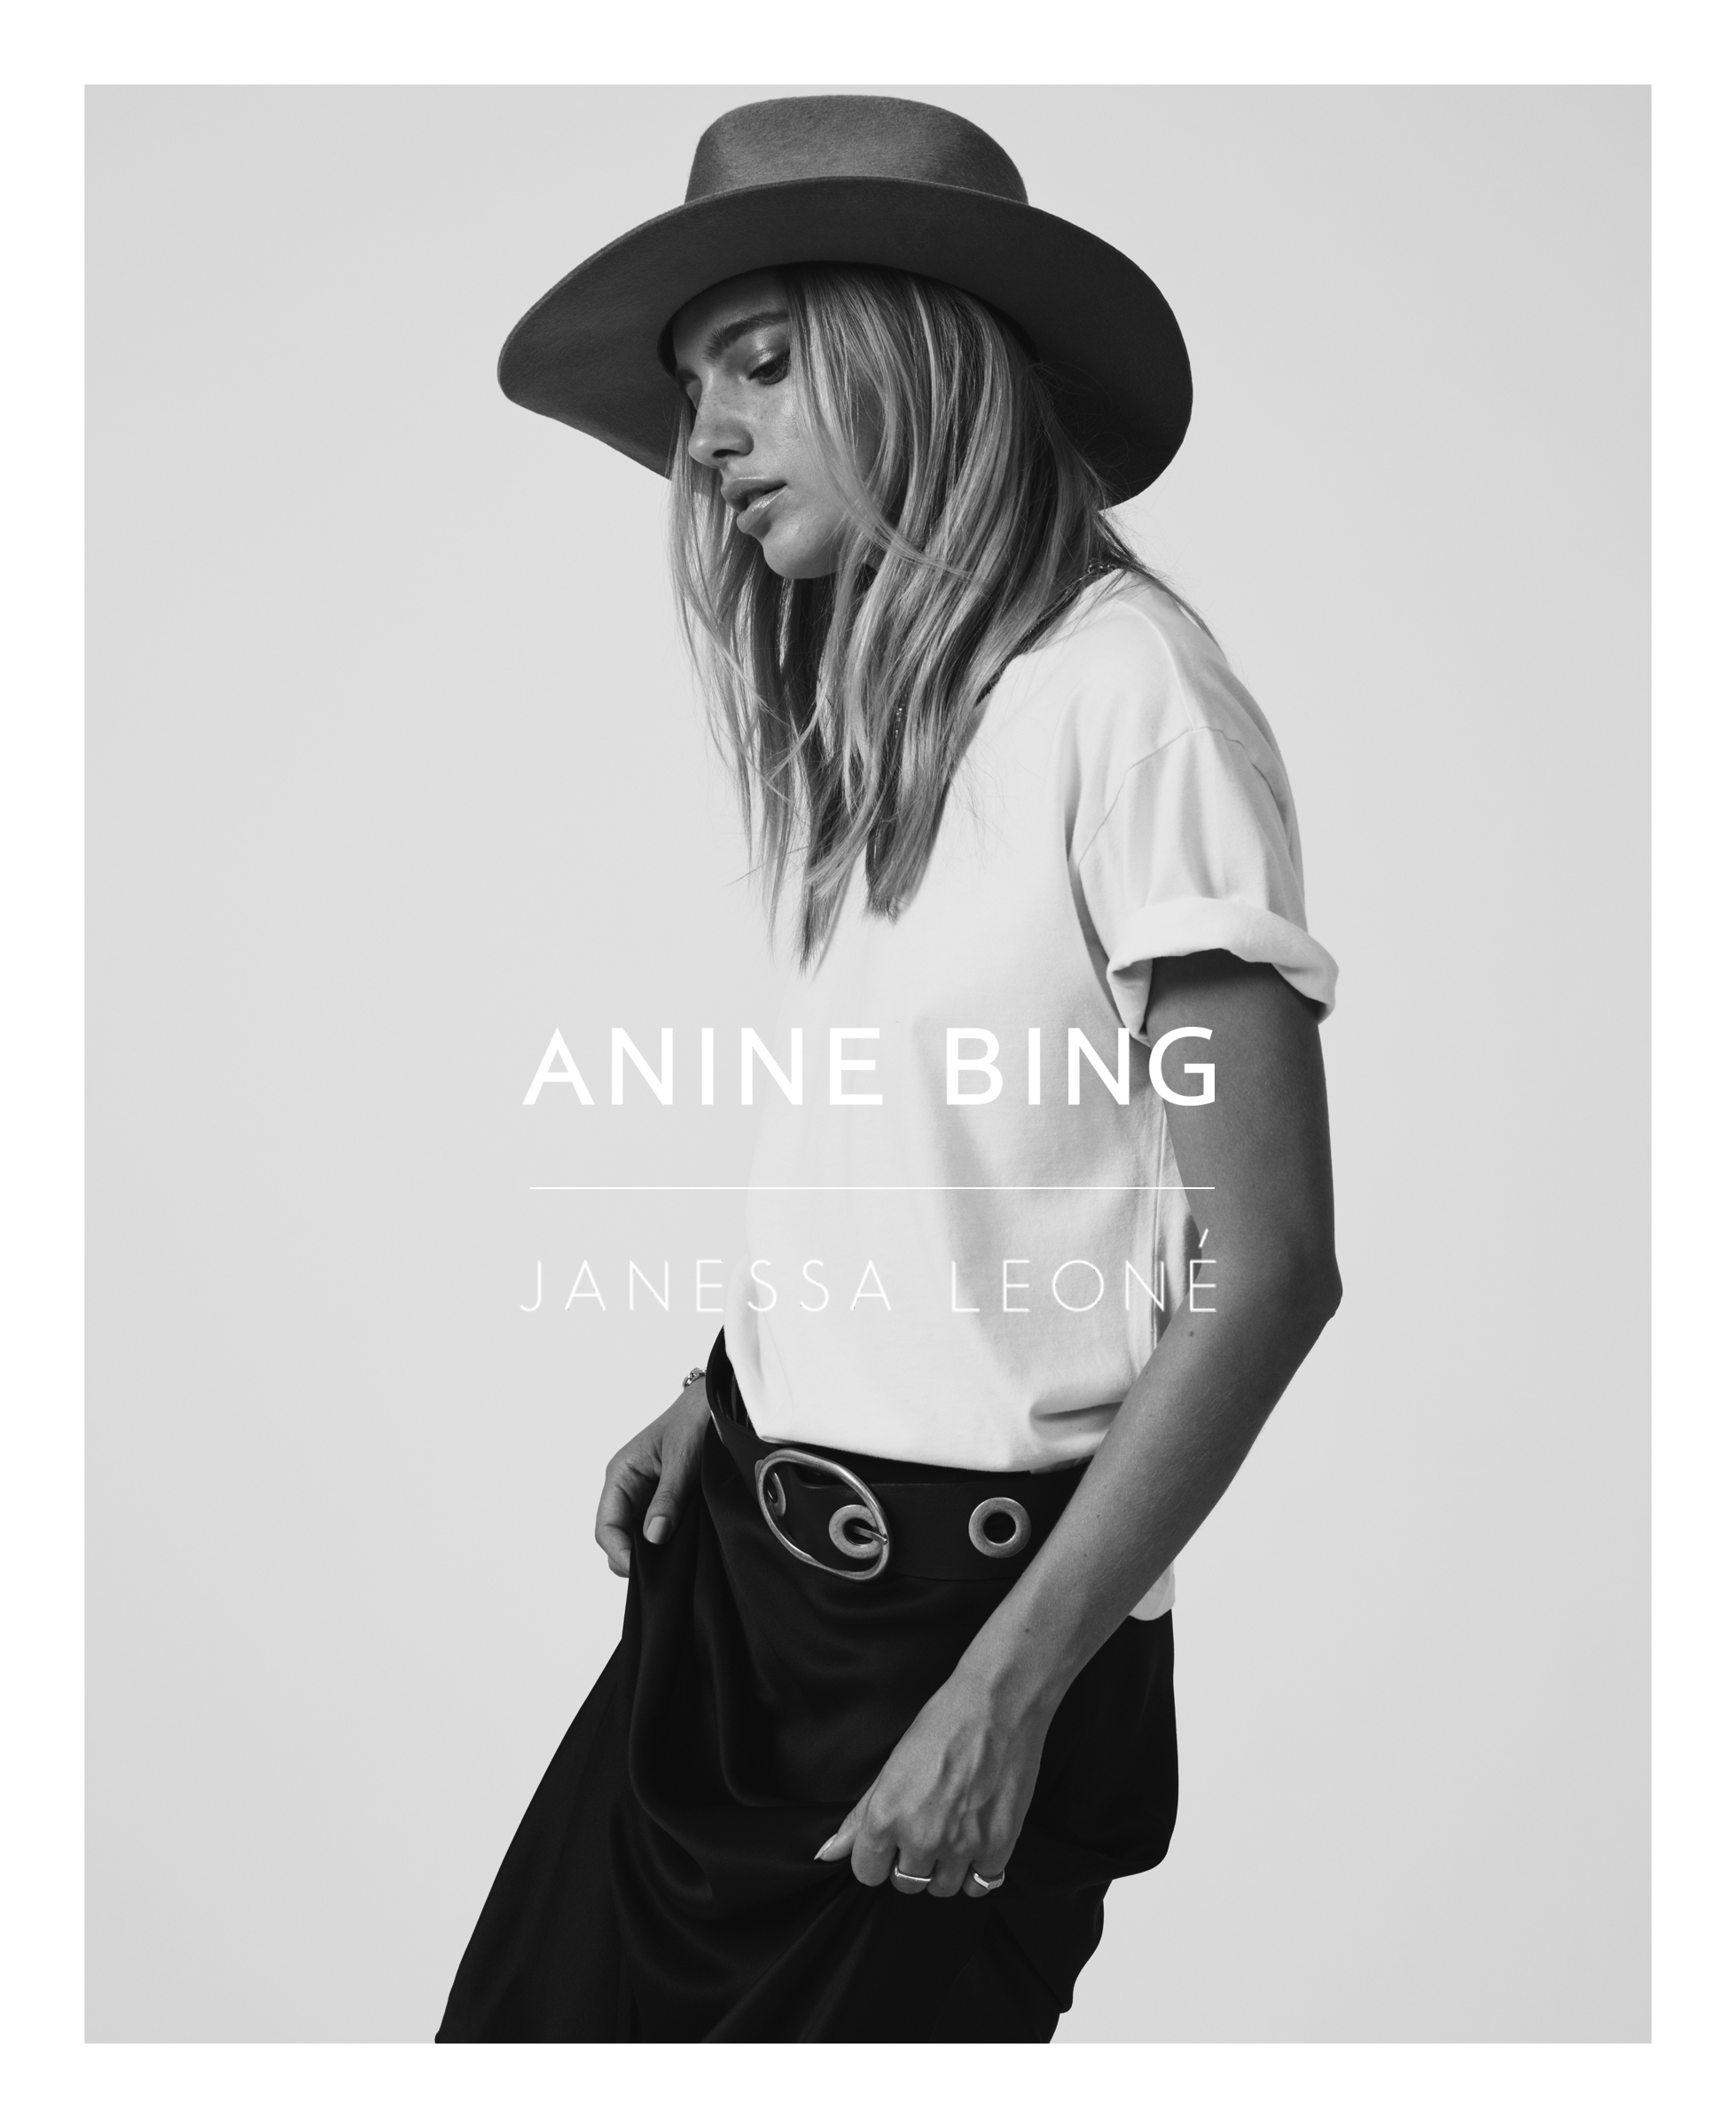 ANINE BING x